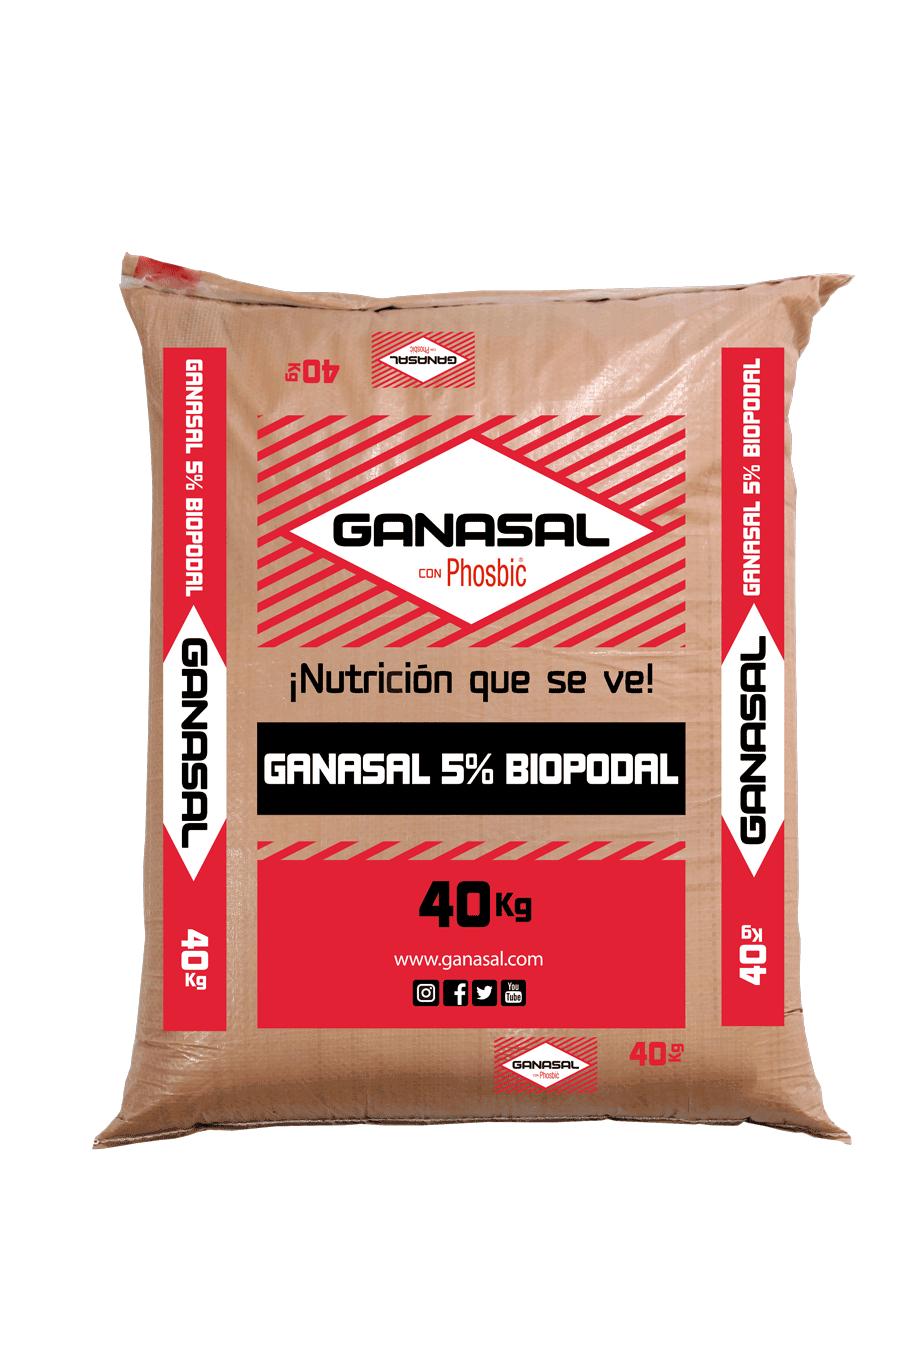 Ganasal 5% Biopodal